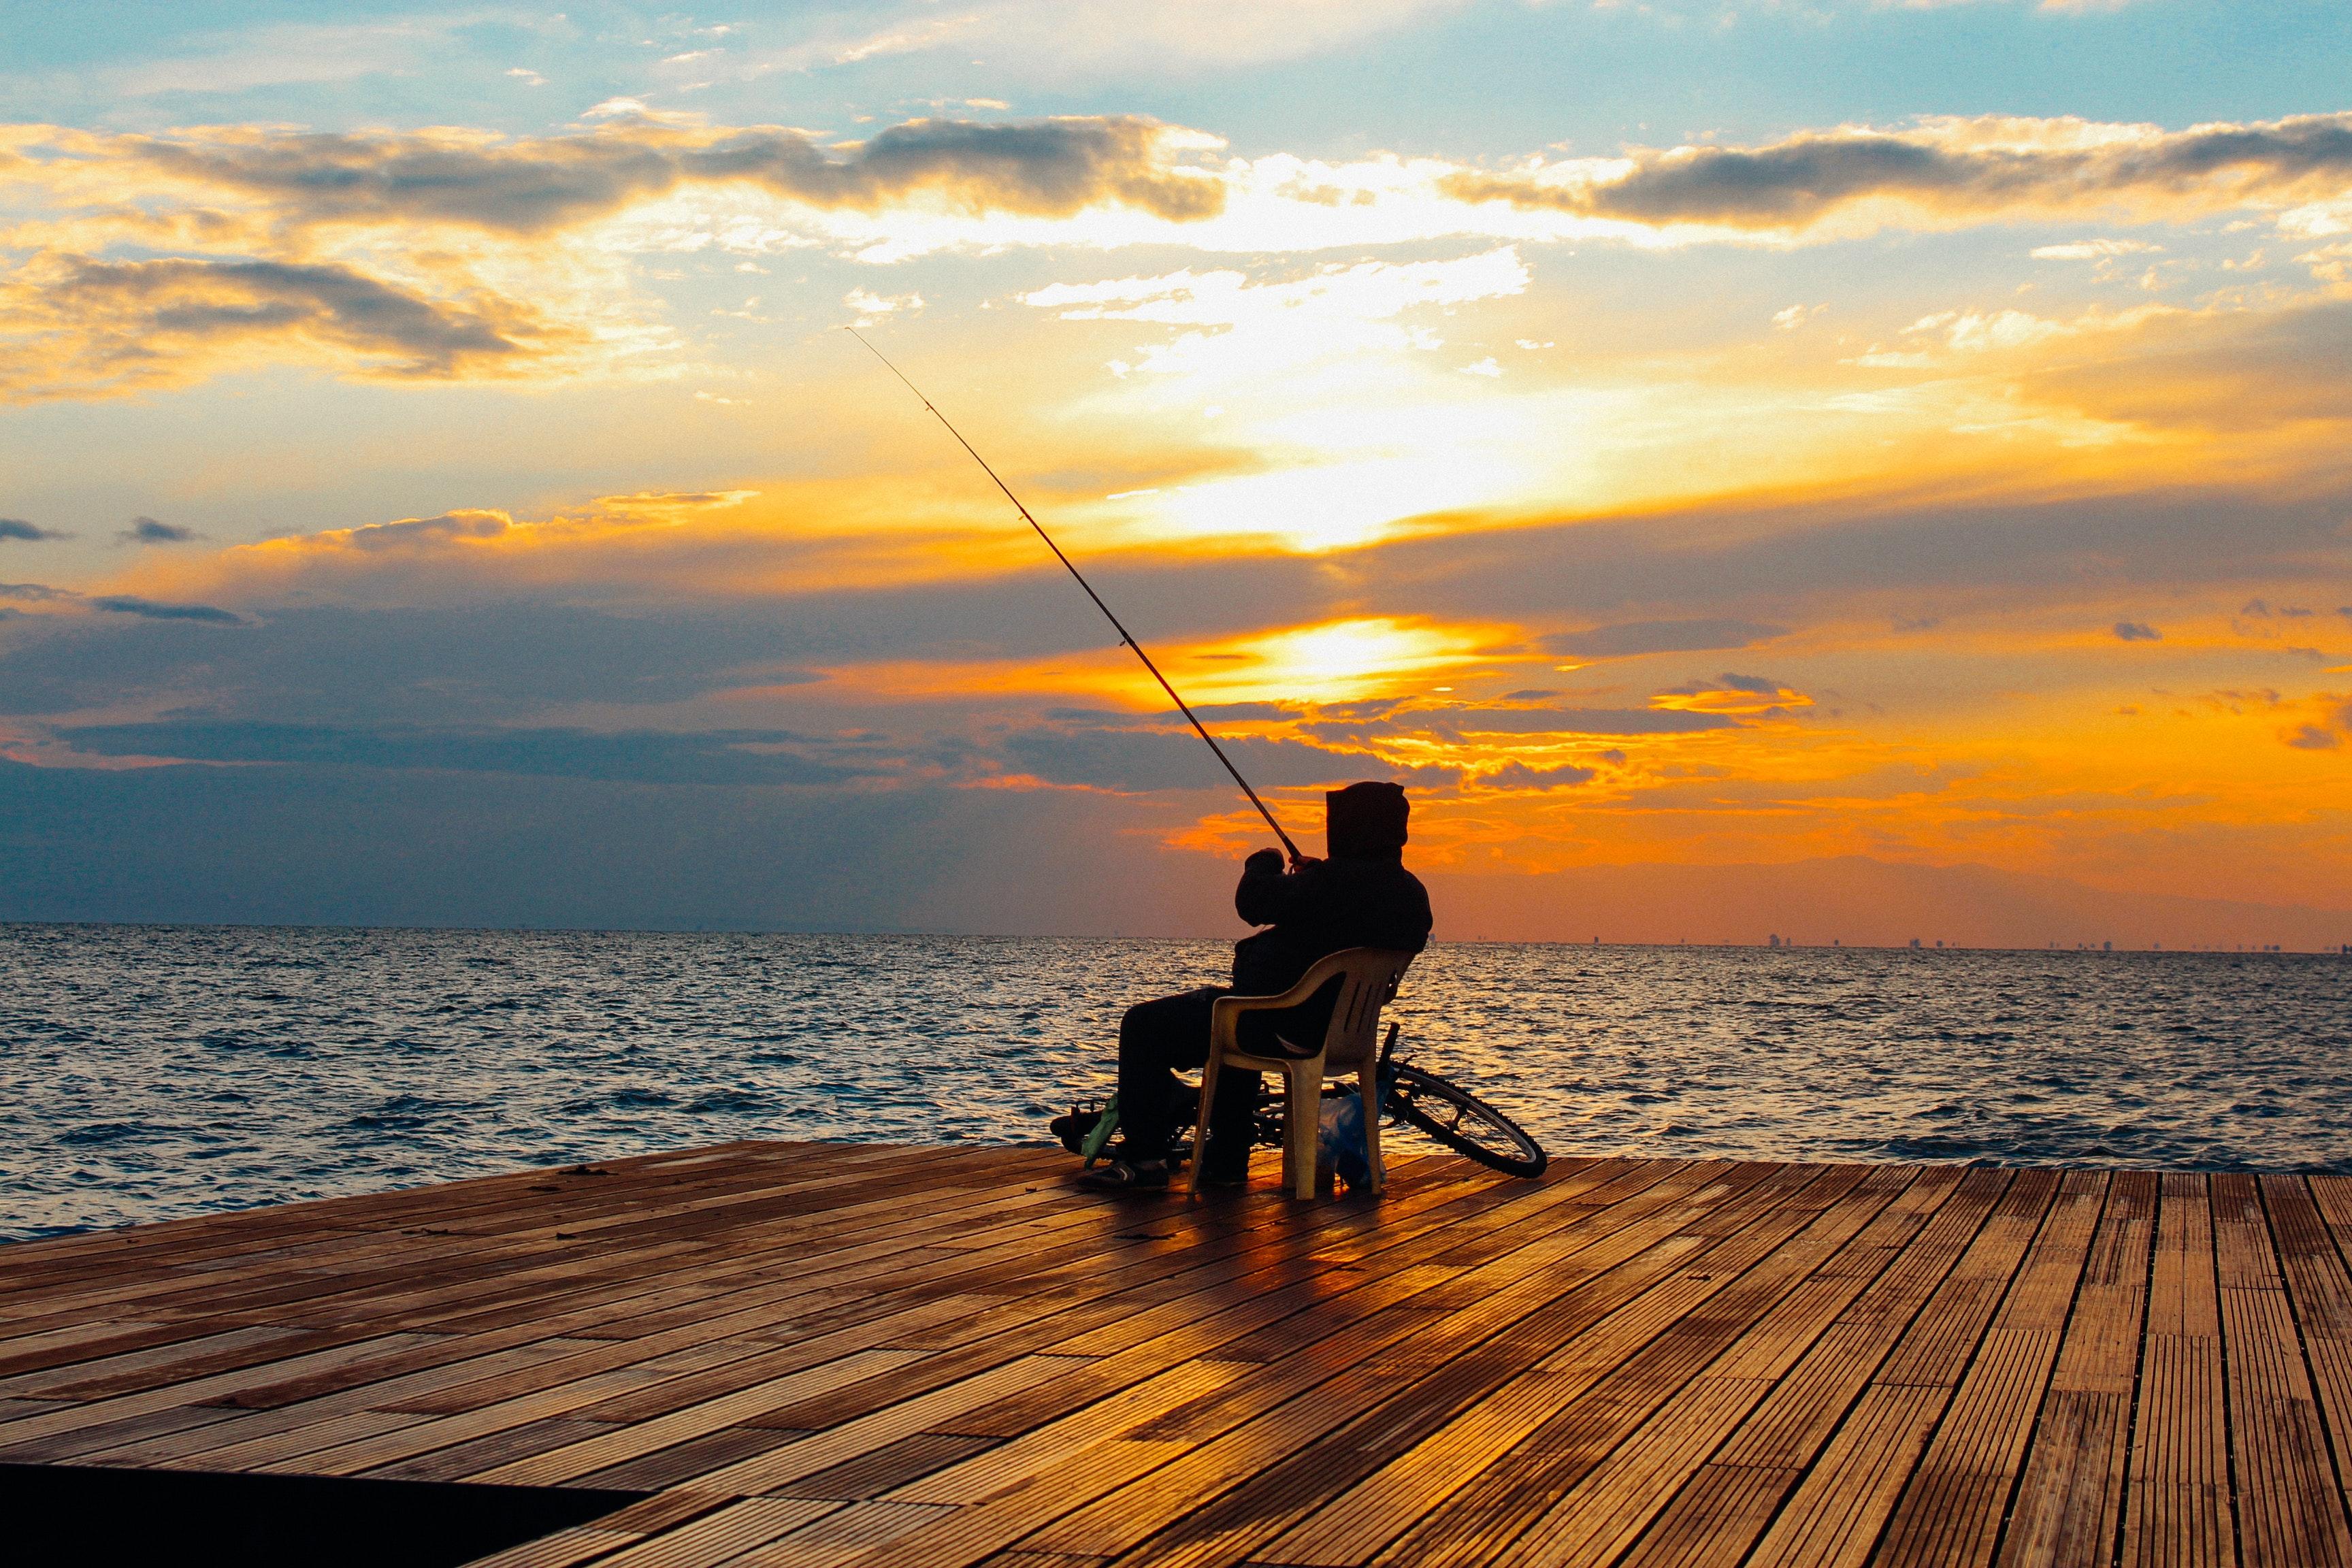 250 engaging fishing photos 183 pexels 183 free stock photos